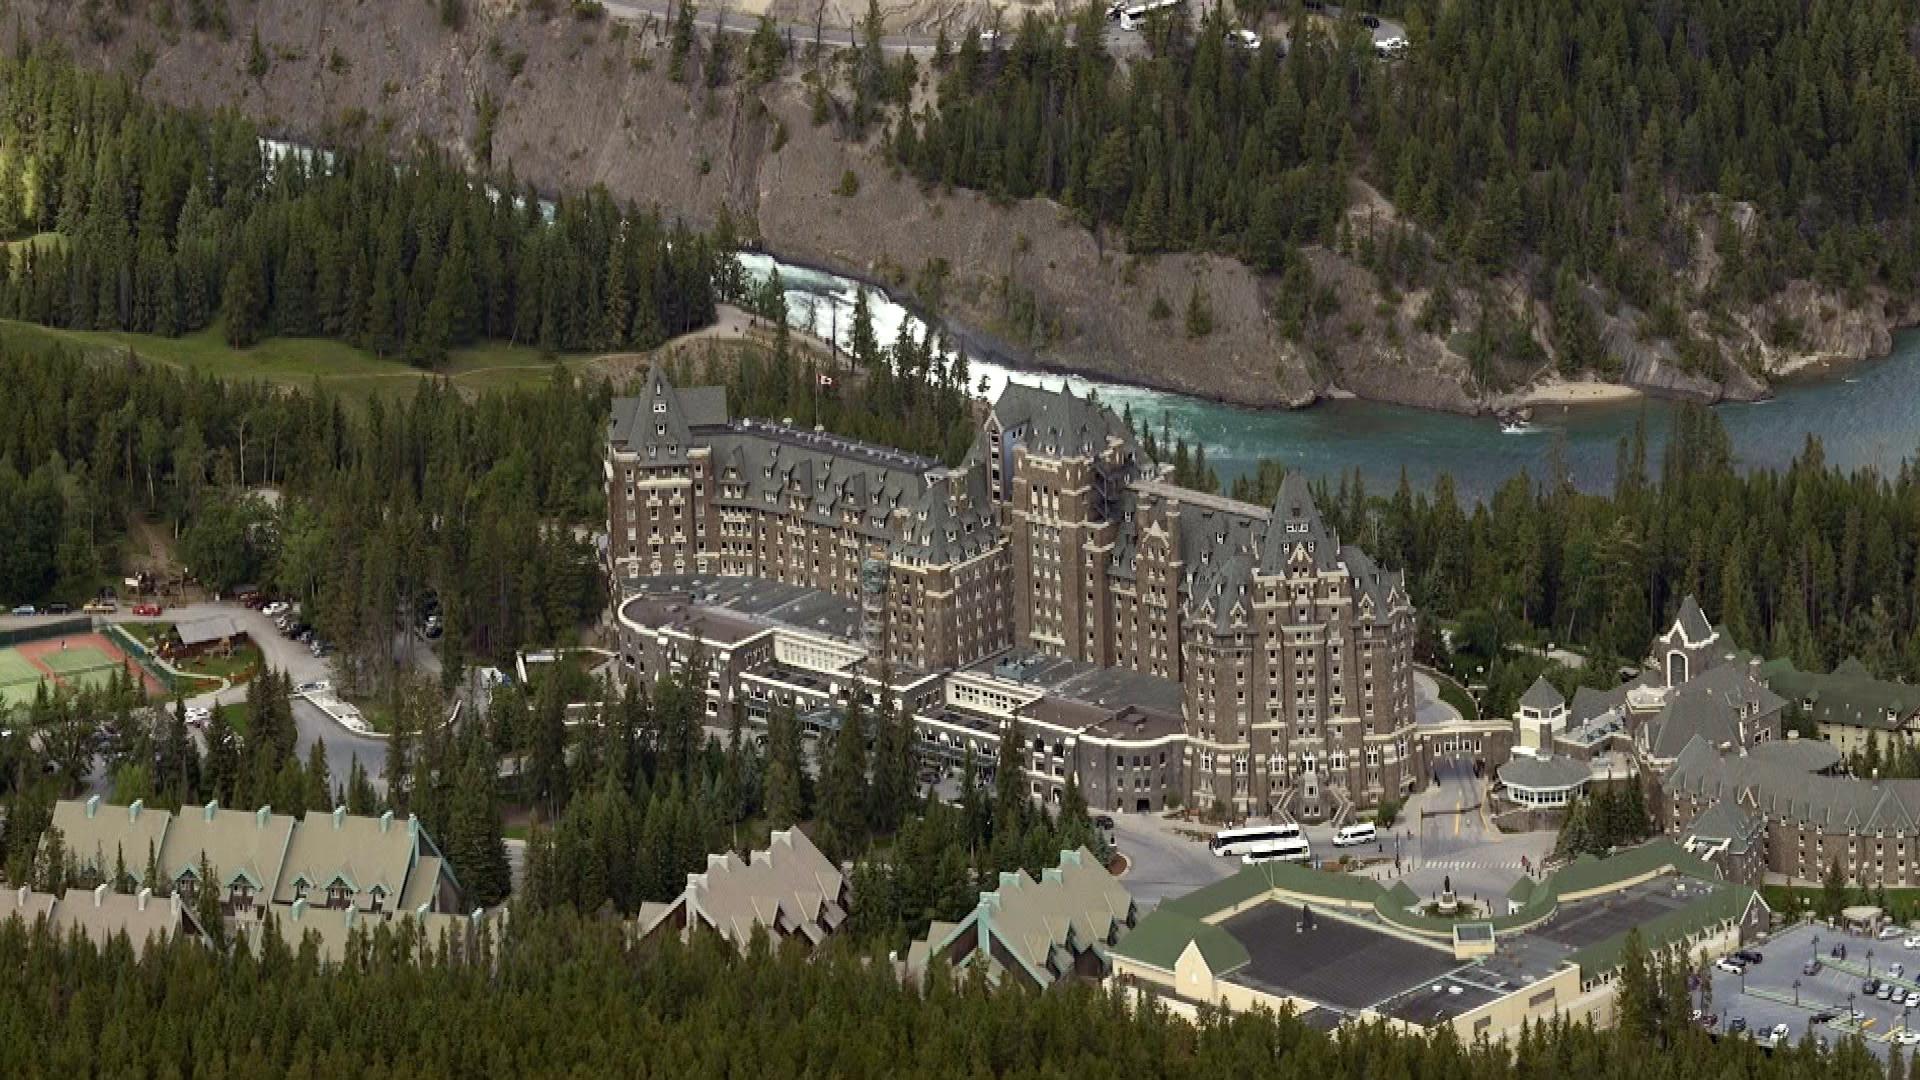 BanBanff Springs Hotel